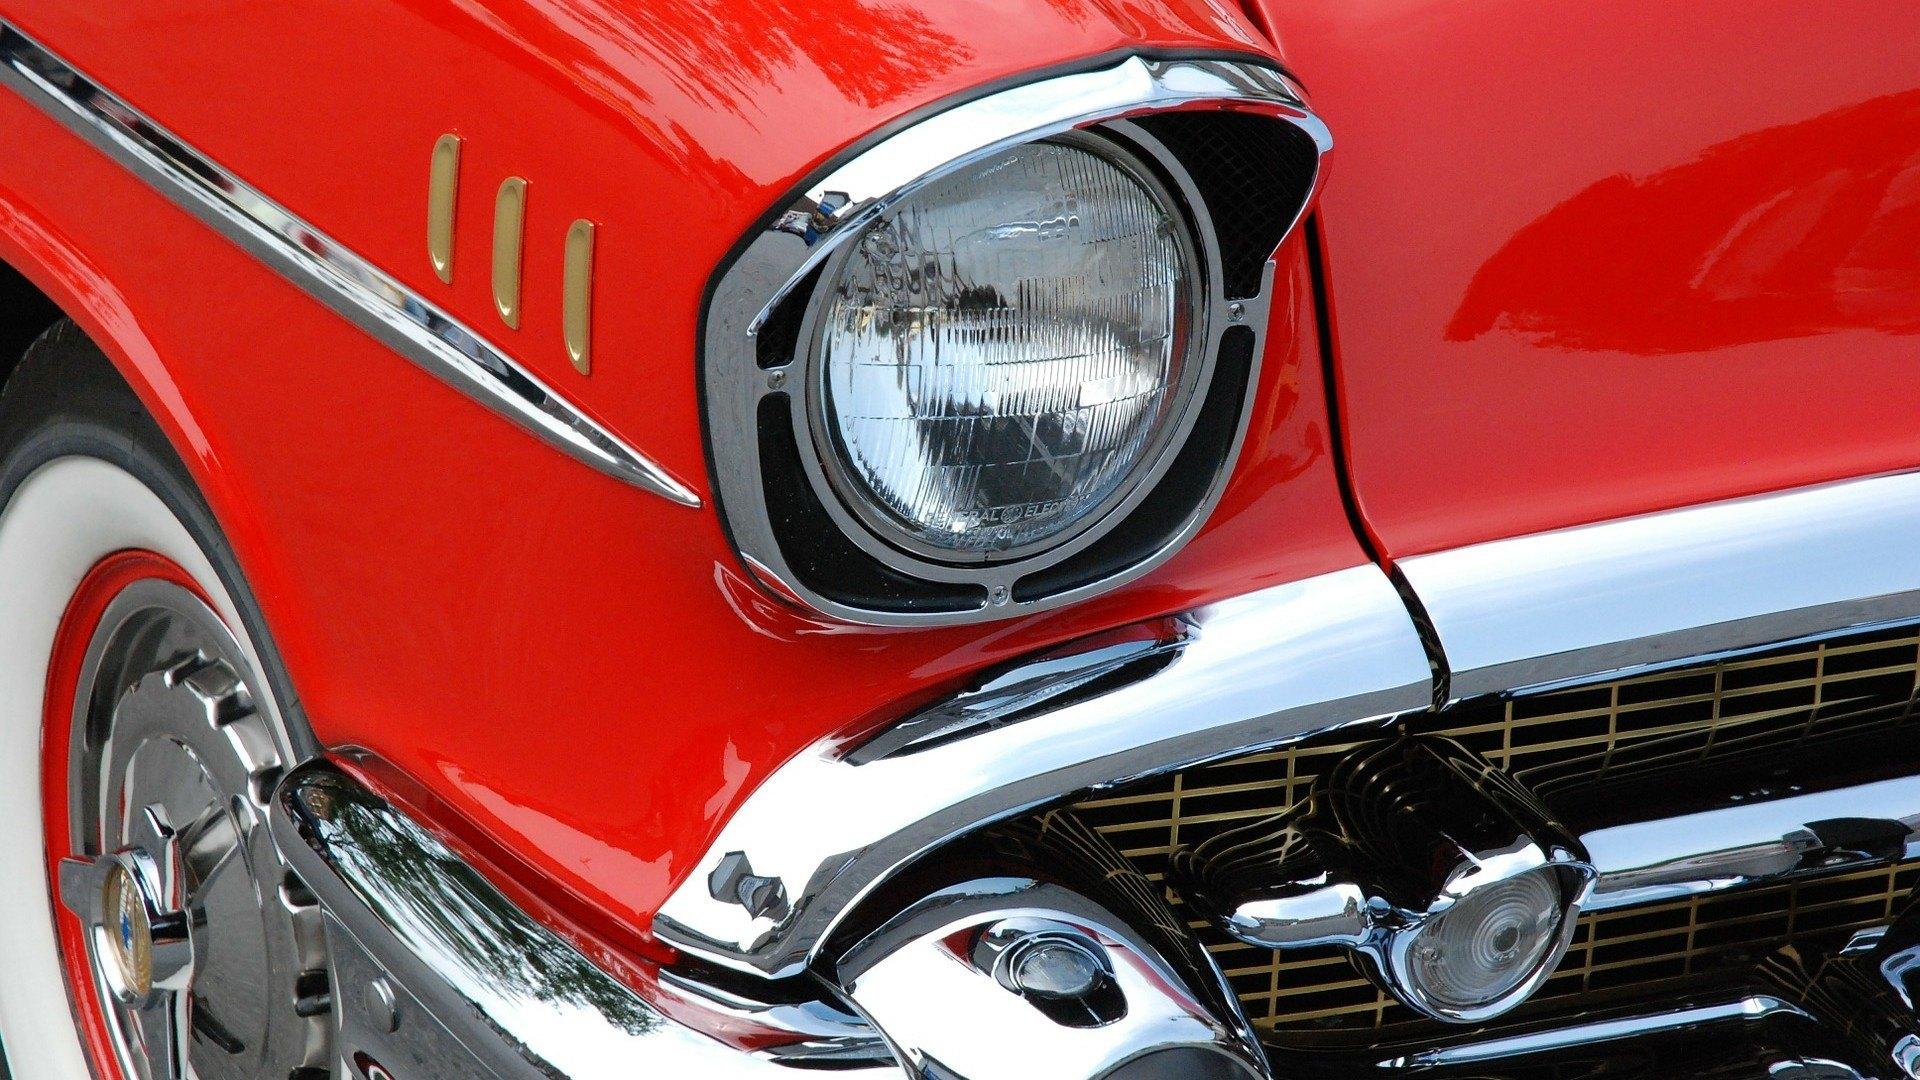 classic-car-76423_1920.jpg